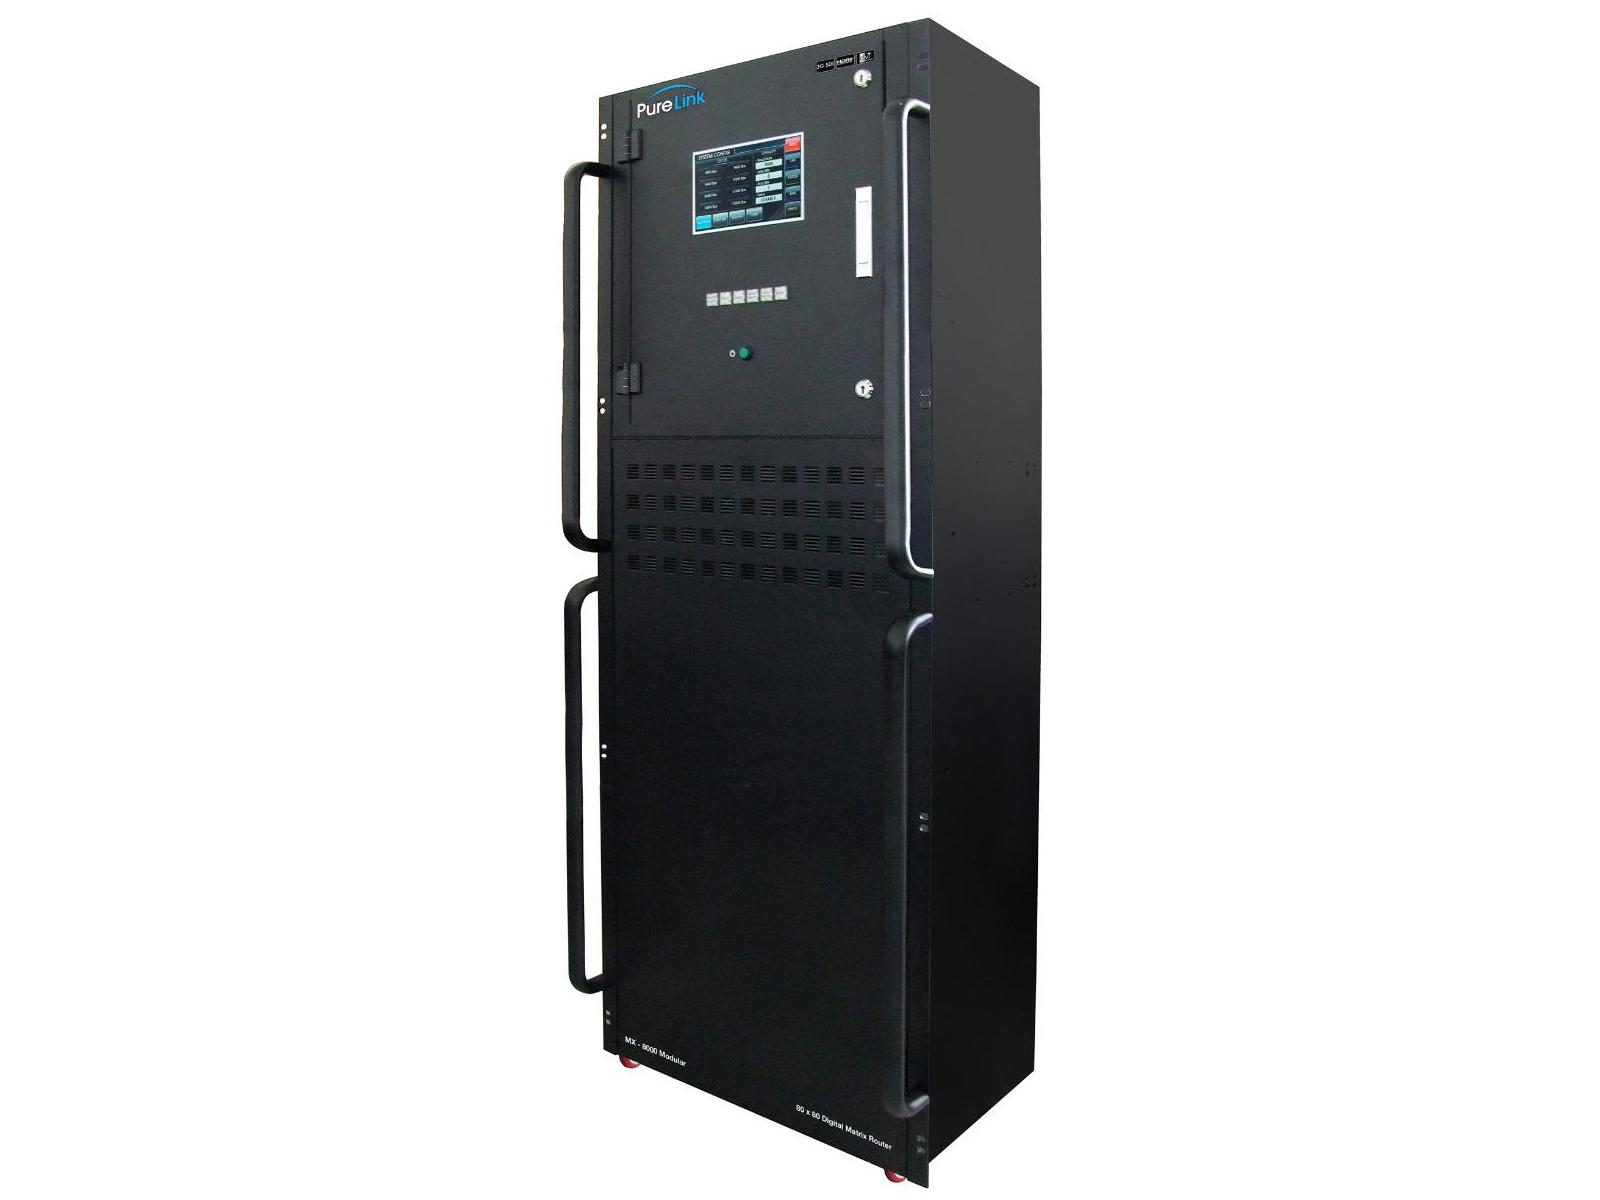 PureLink mx-8000 80x80 Modular Type Digital Matrix Router mx-8000